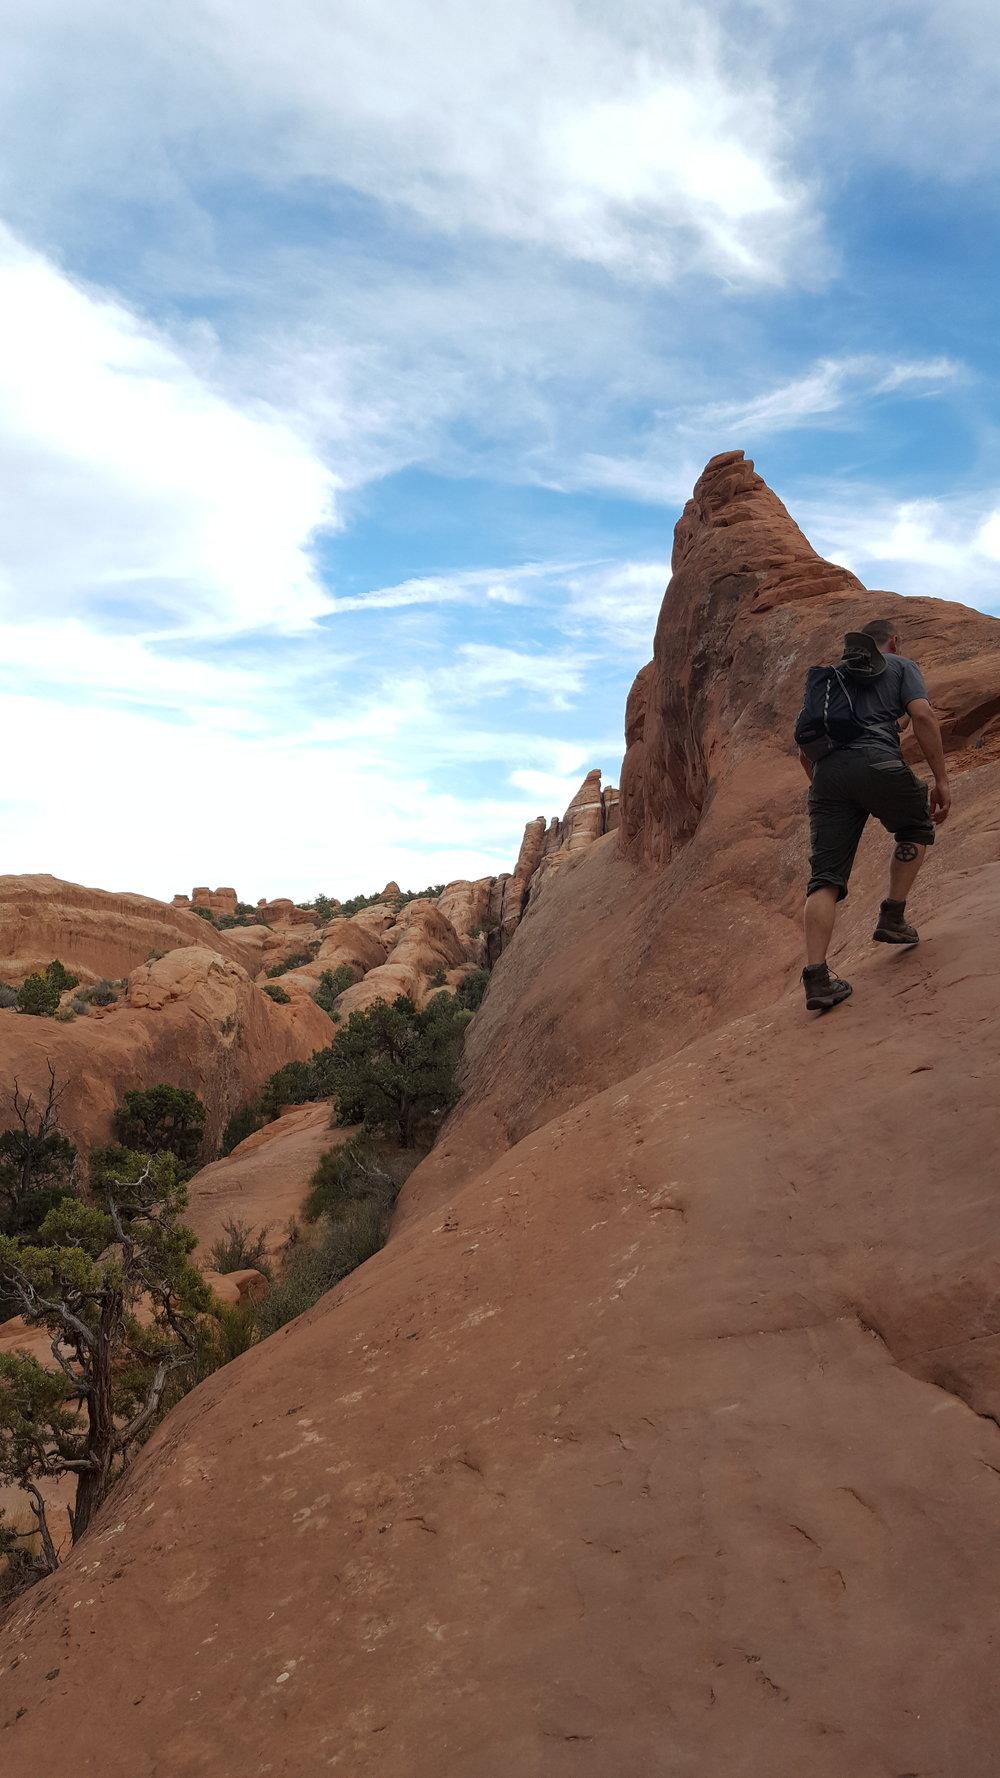 4-arches-hike-primitive-rekinspire-climb.jpg